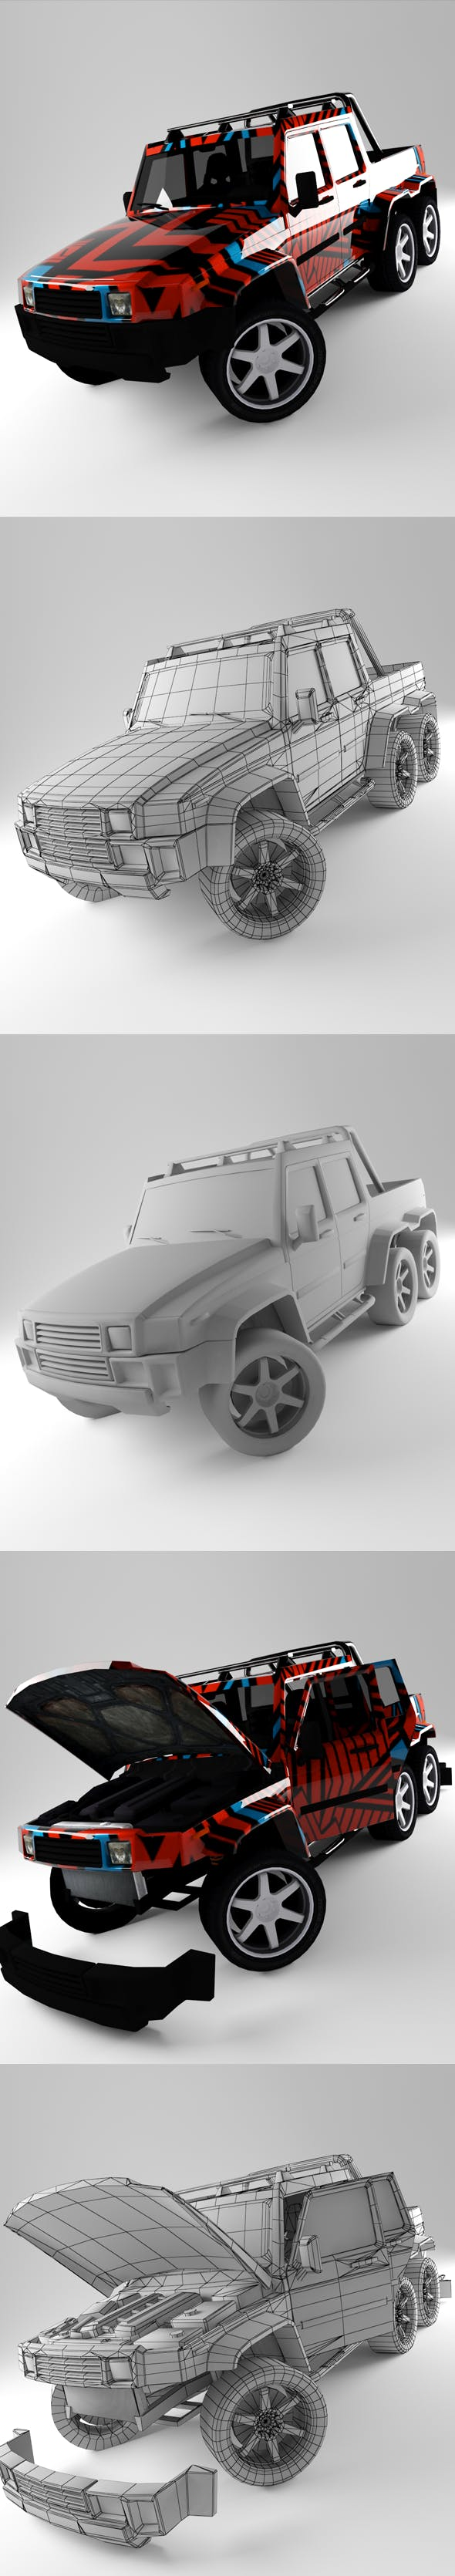 H2 - 3DOcean Item for Sale